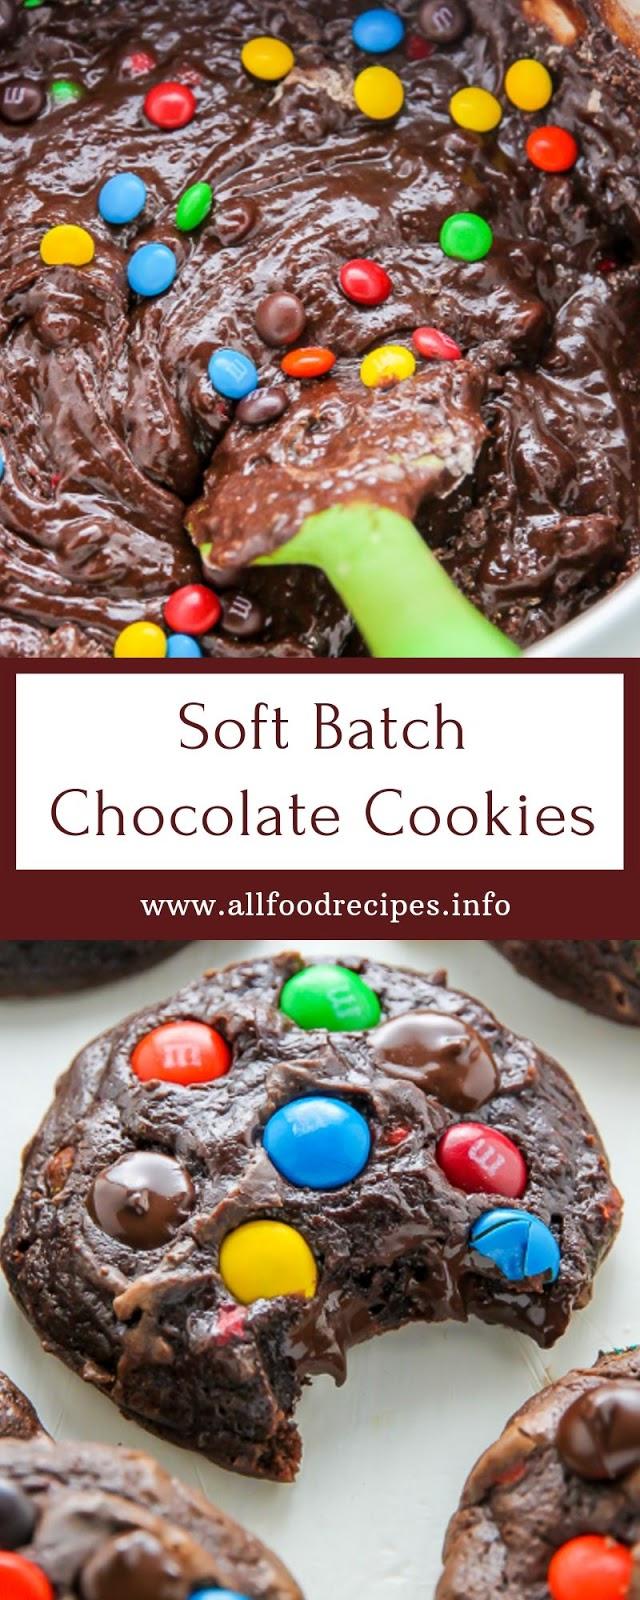 Soft Batch Chocolate Cookies